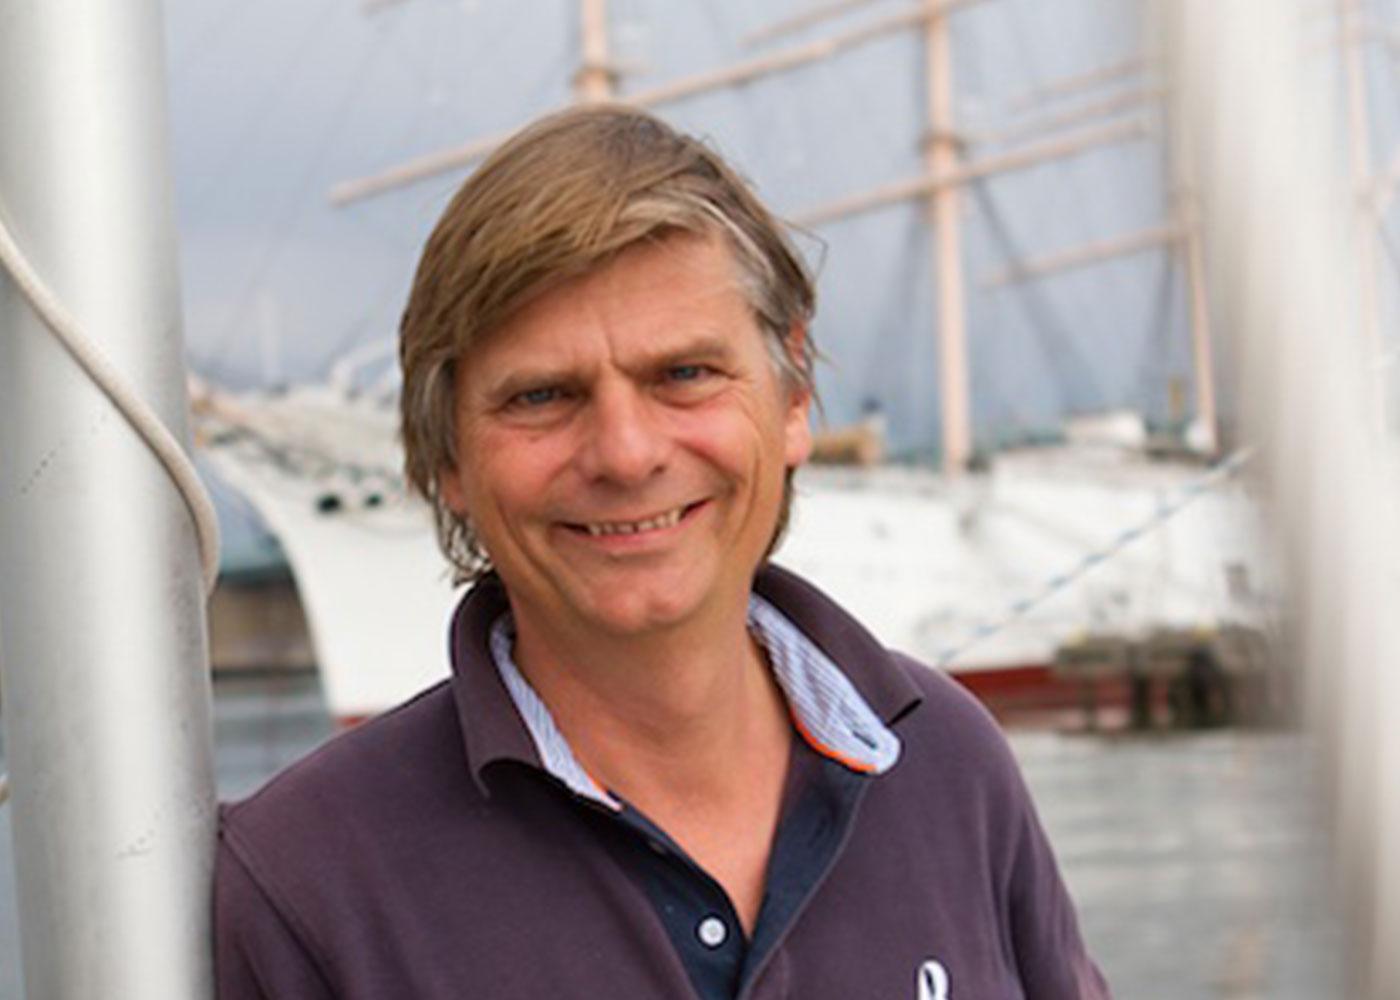 WET-protect Brand Ambassador Leon Schulz, Yachtmaster, Regina Sailing